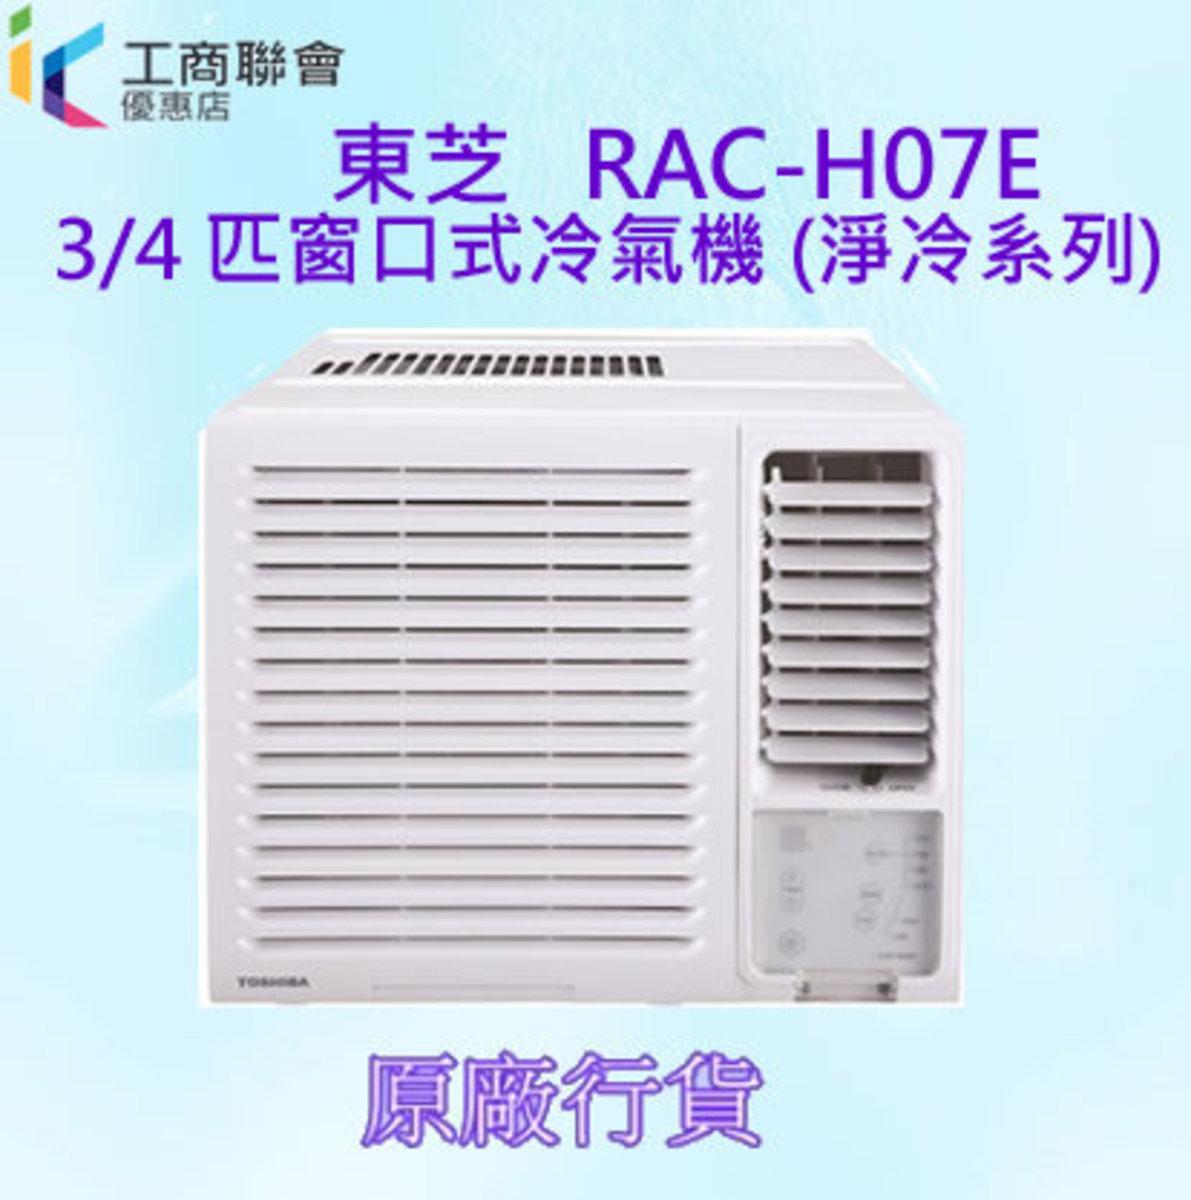 RACH07E 3/4 匹窗口式冷氣機 (淨冷系列) (免費除舊服務)